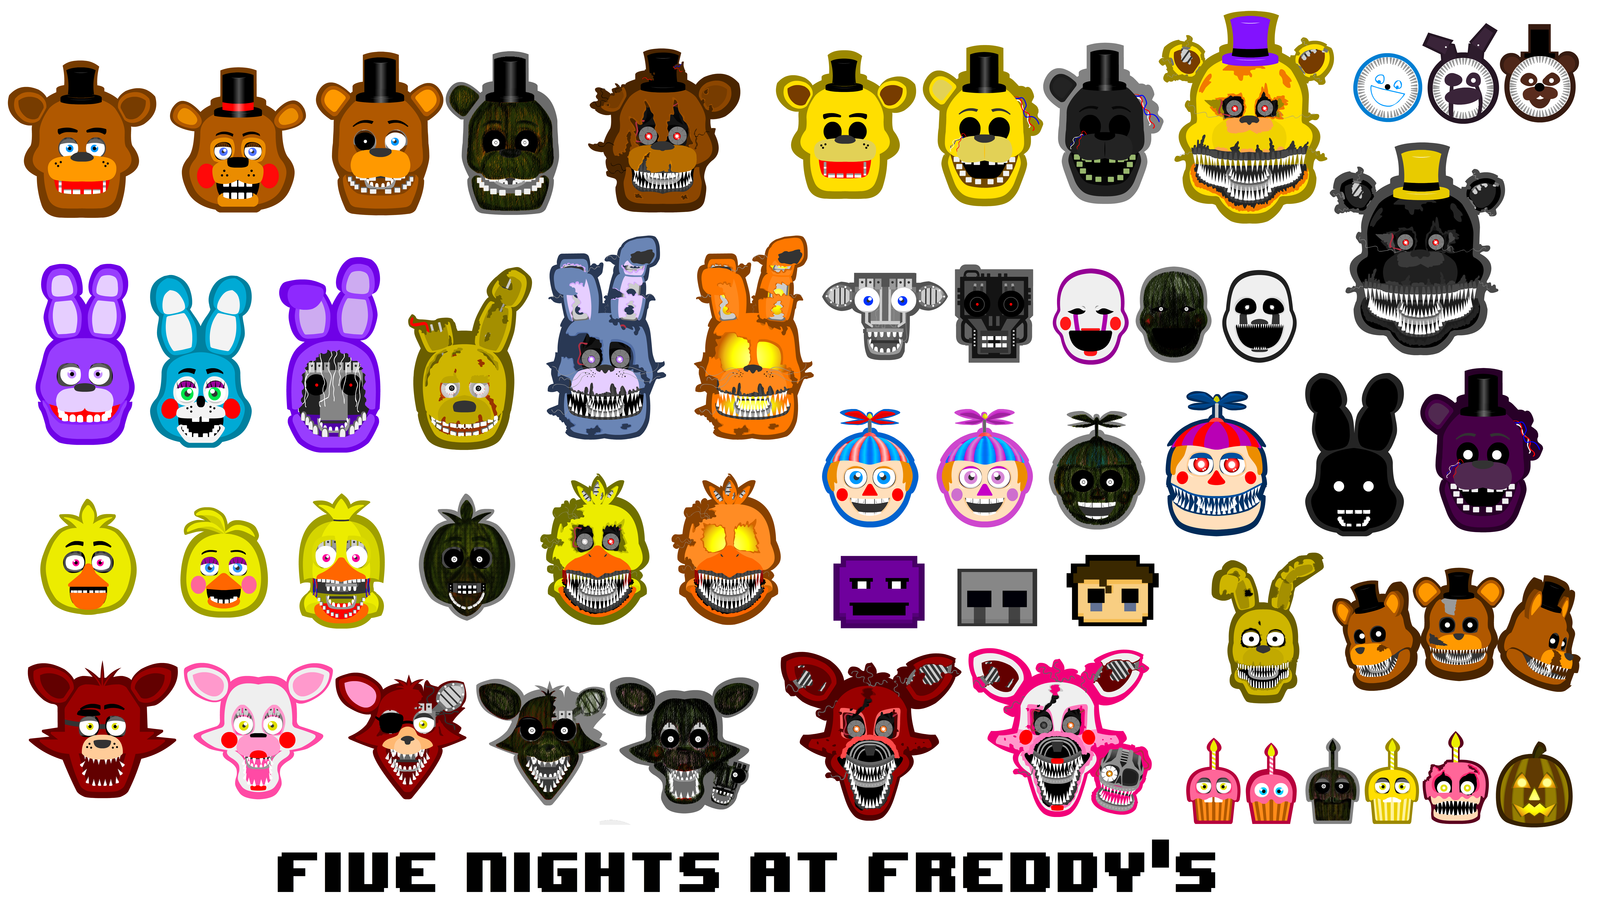 Add media report rss all fnaf characters view original